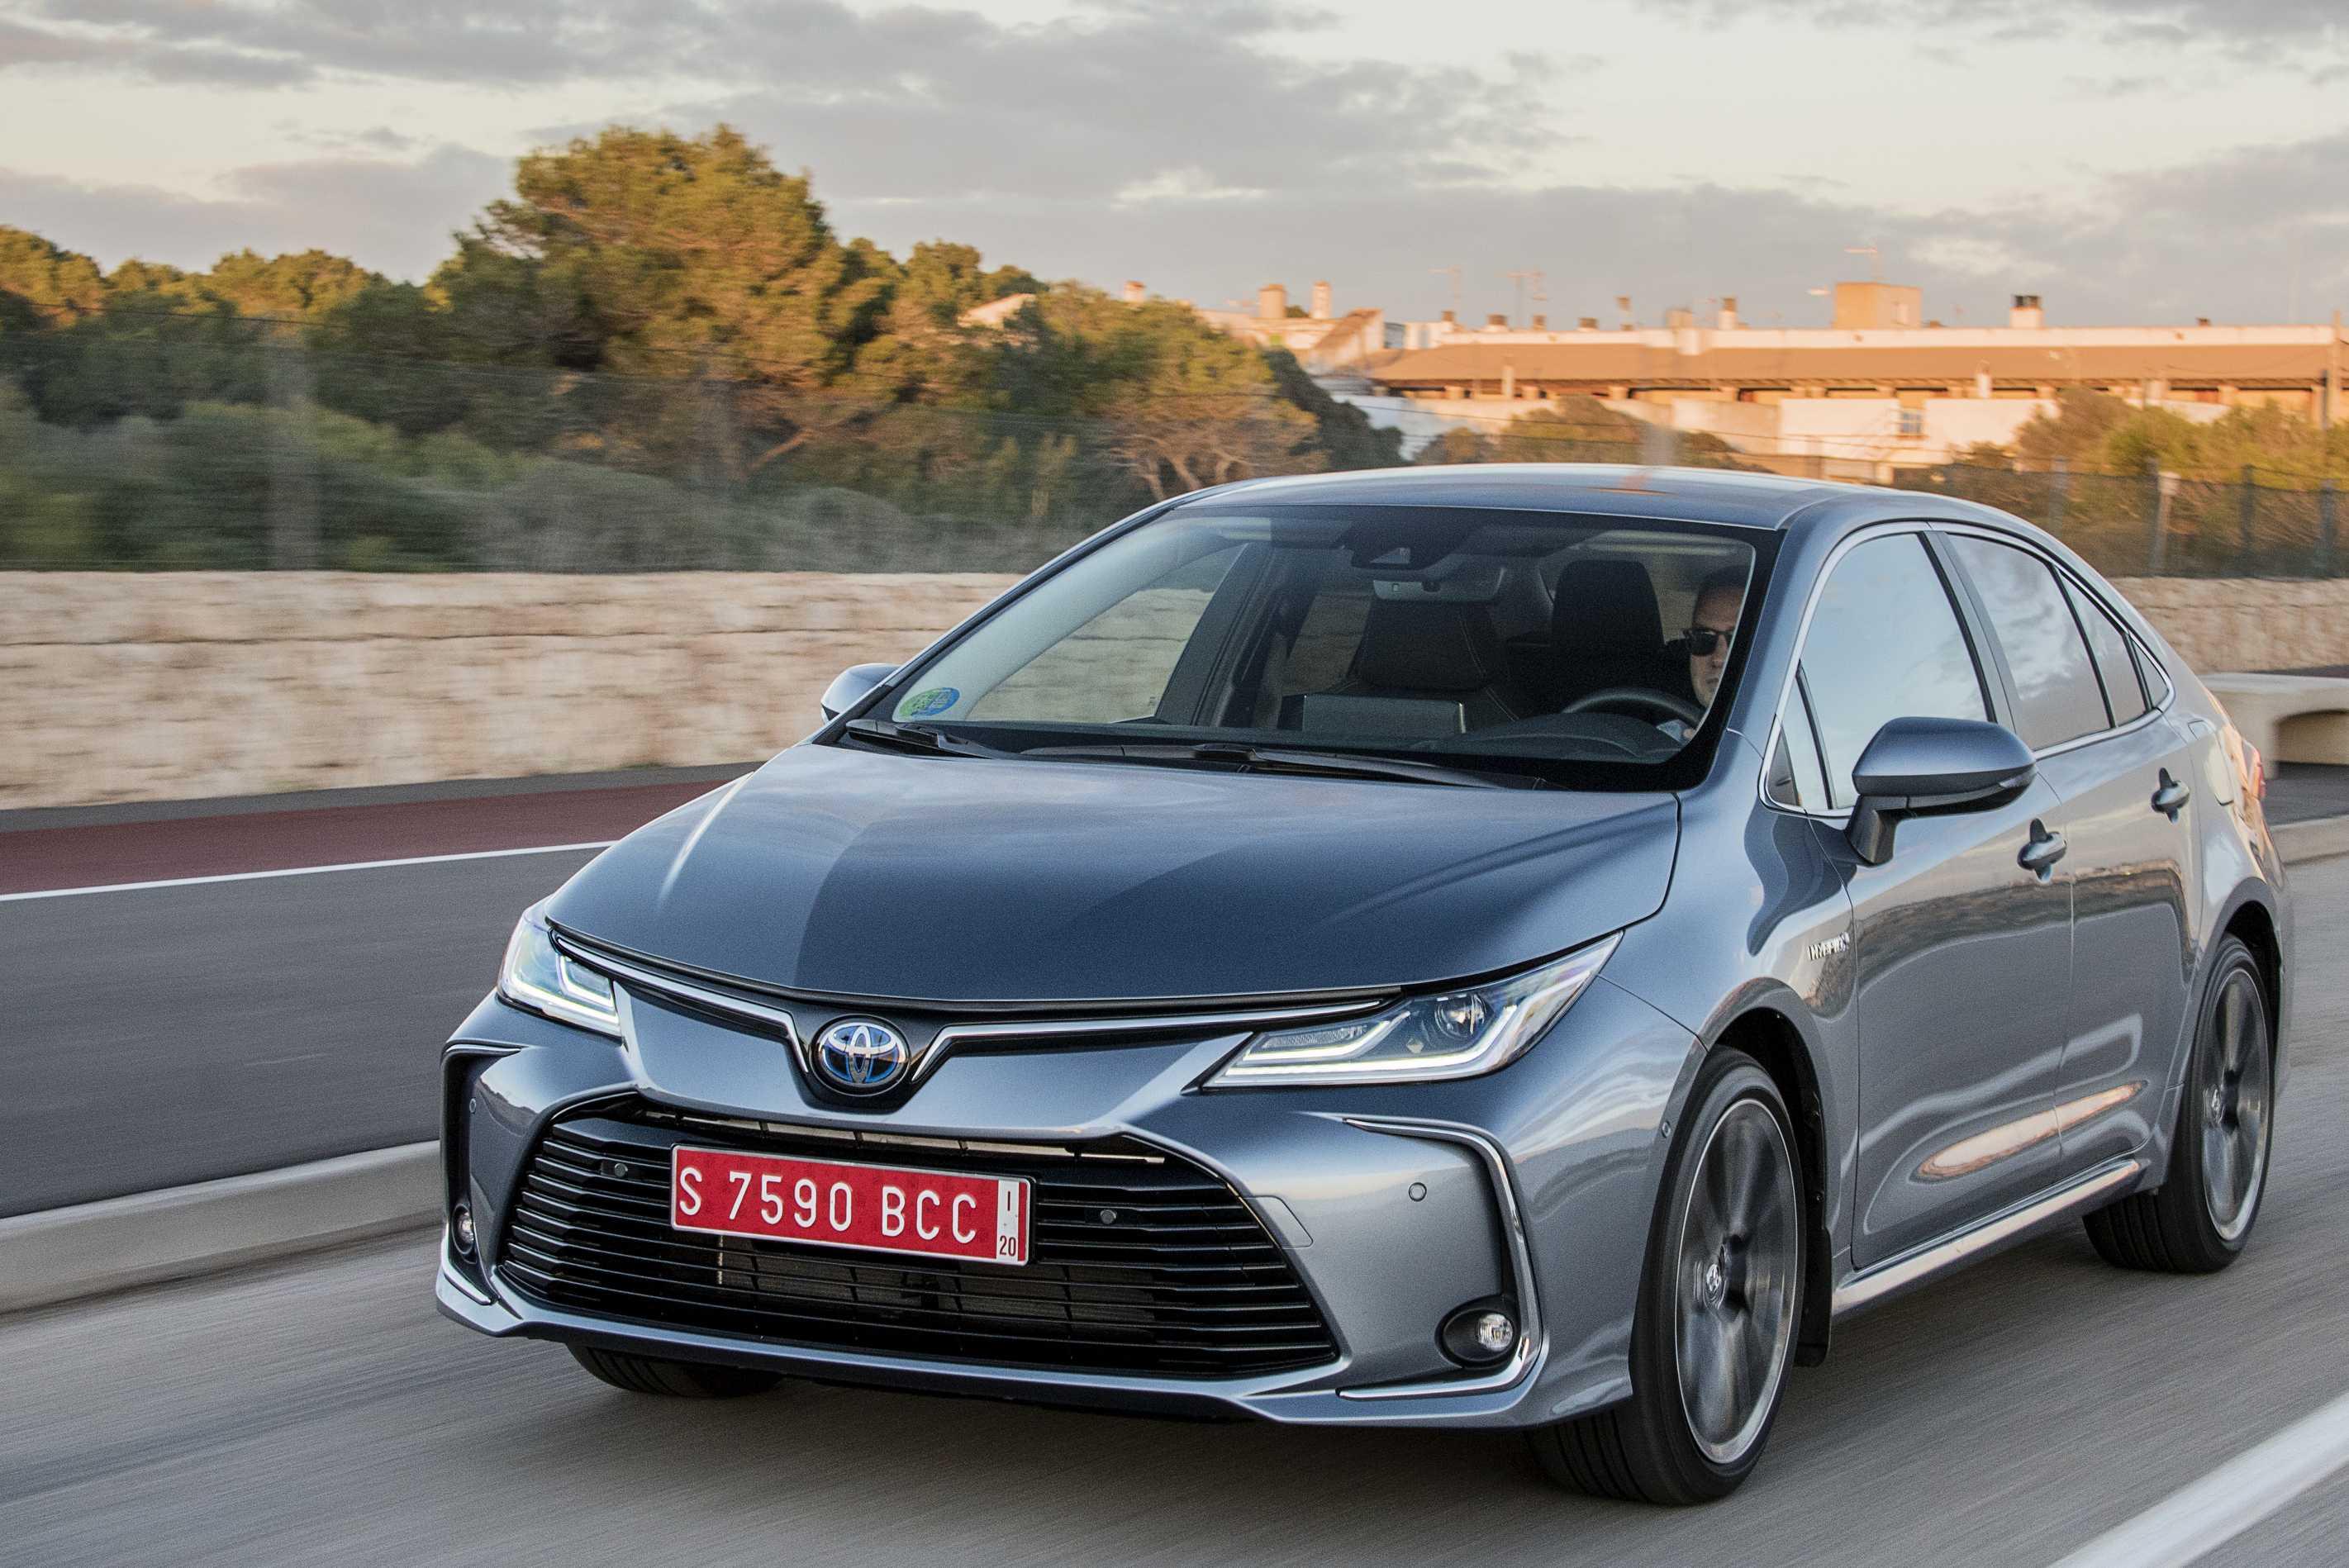 Тойота королла 2019 - характеристики, отзывы, toyota corolla 2019